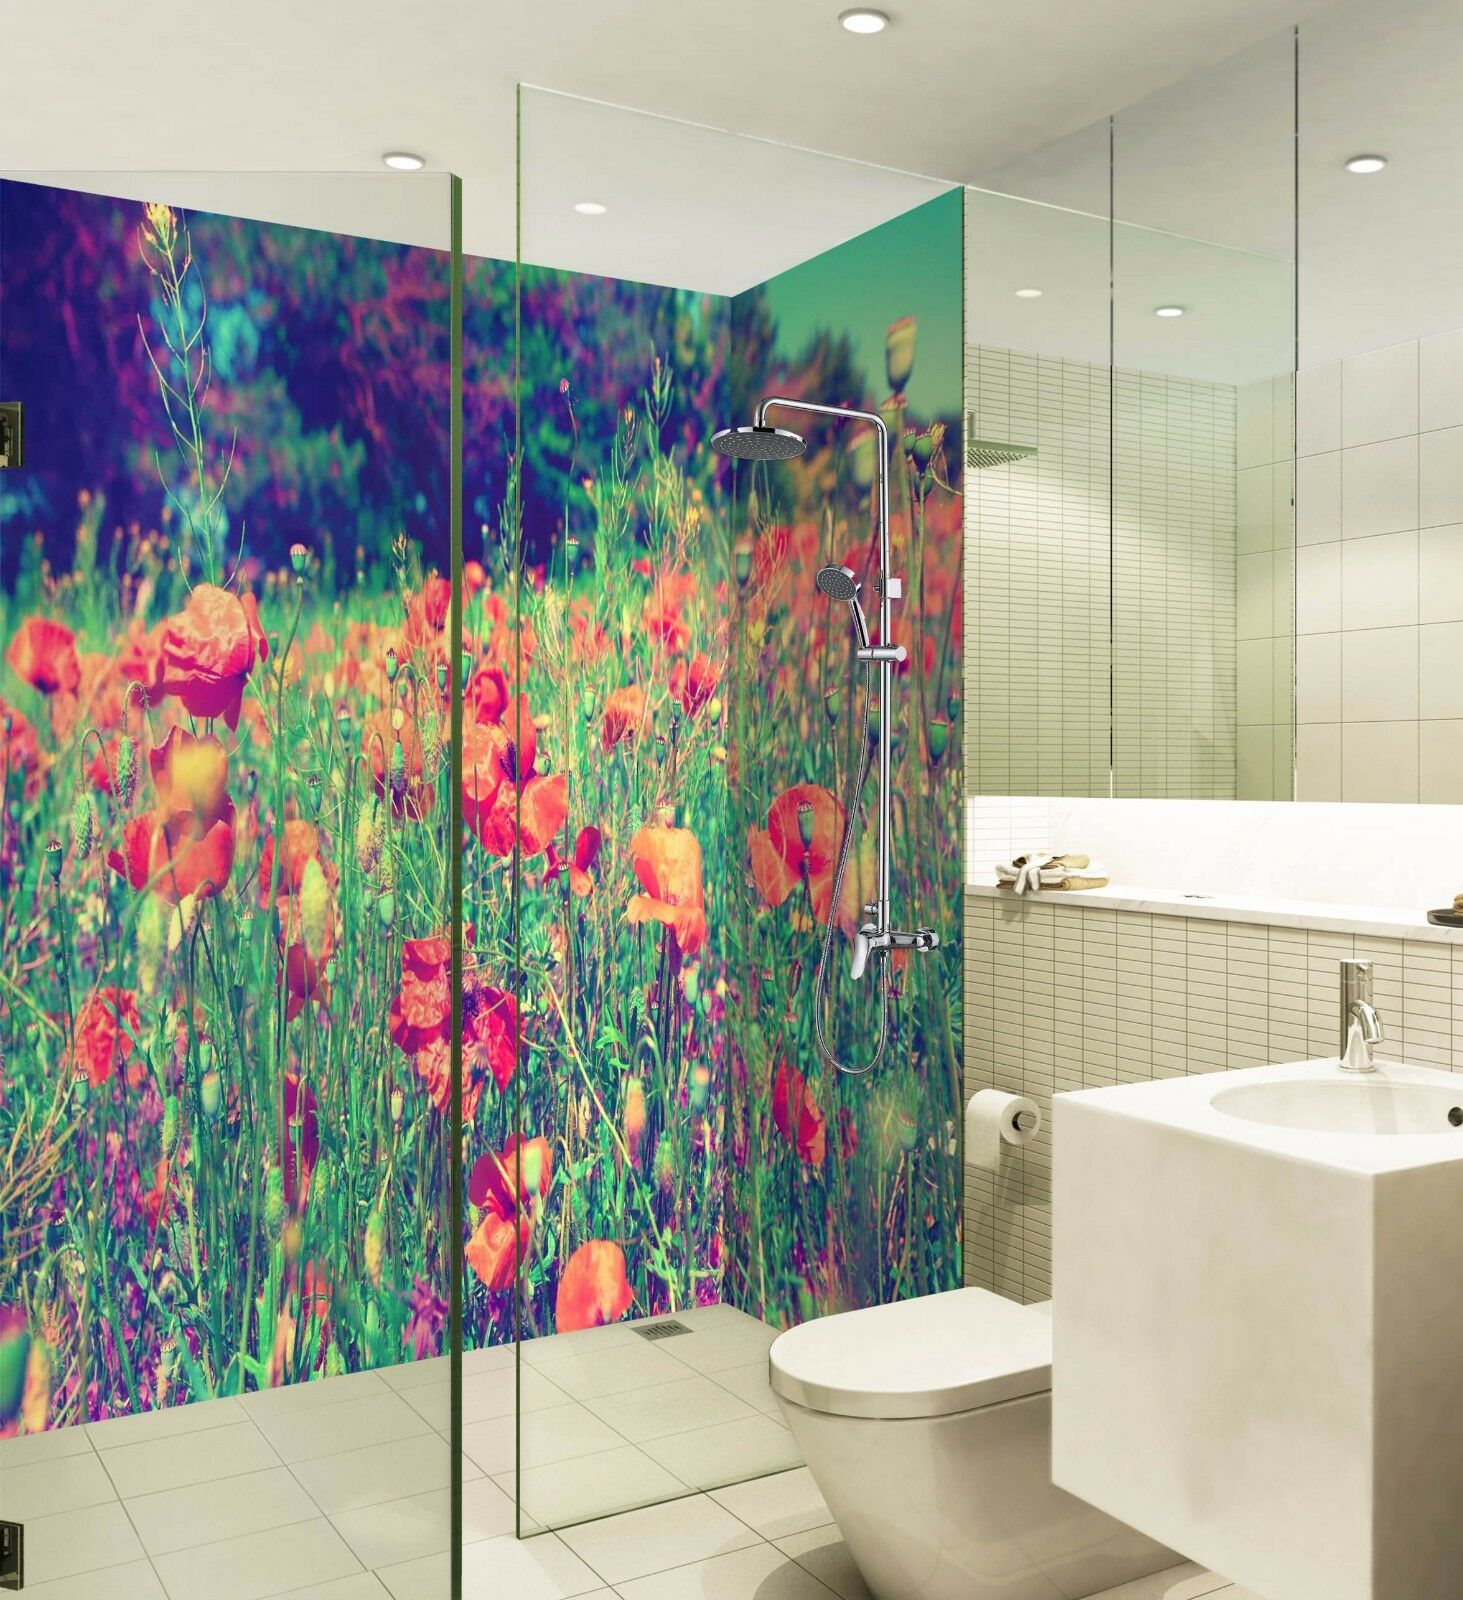 3D Anthemy 7007  WallPaper Bathroom Print Decal Wall Deco AJ WALLPAPER AU